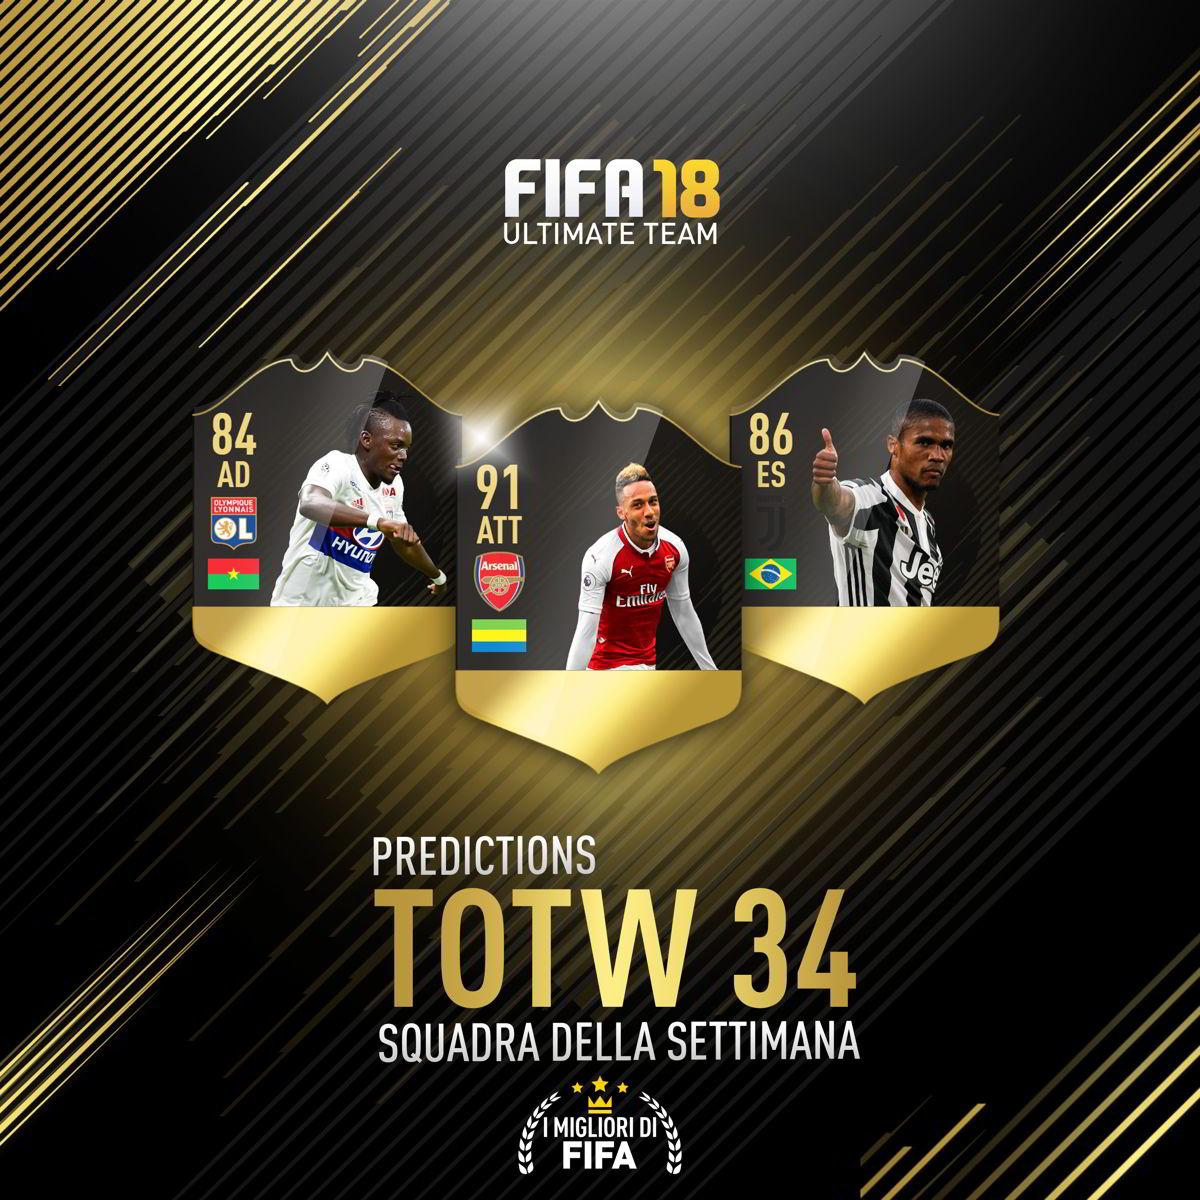 Totw 34 Predictions